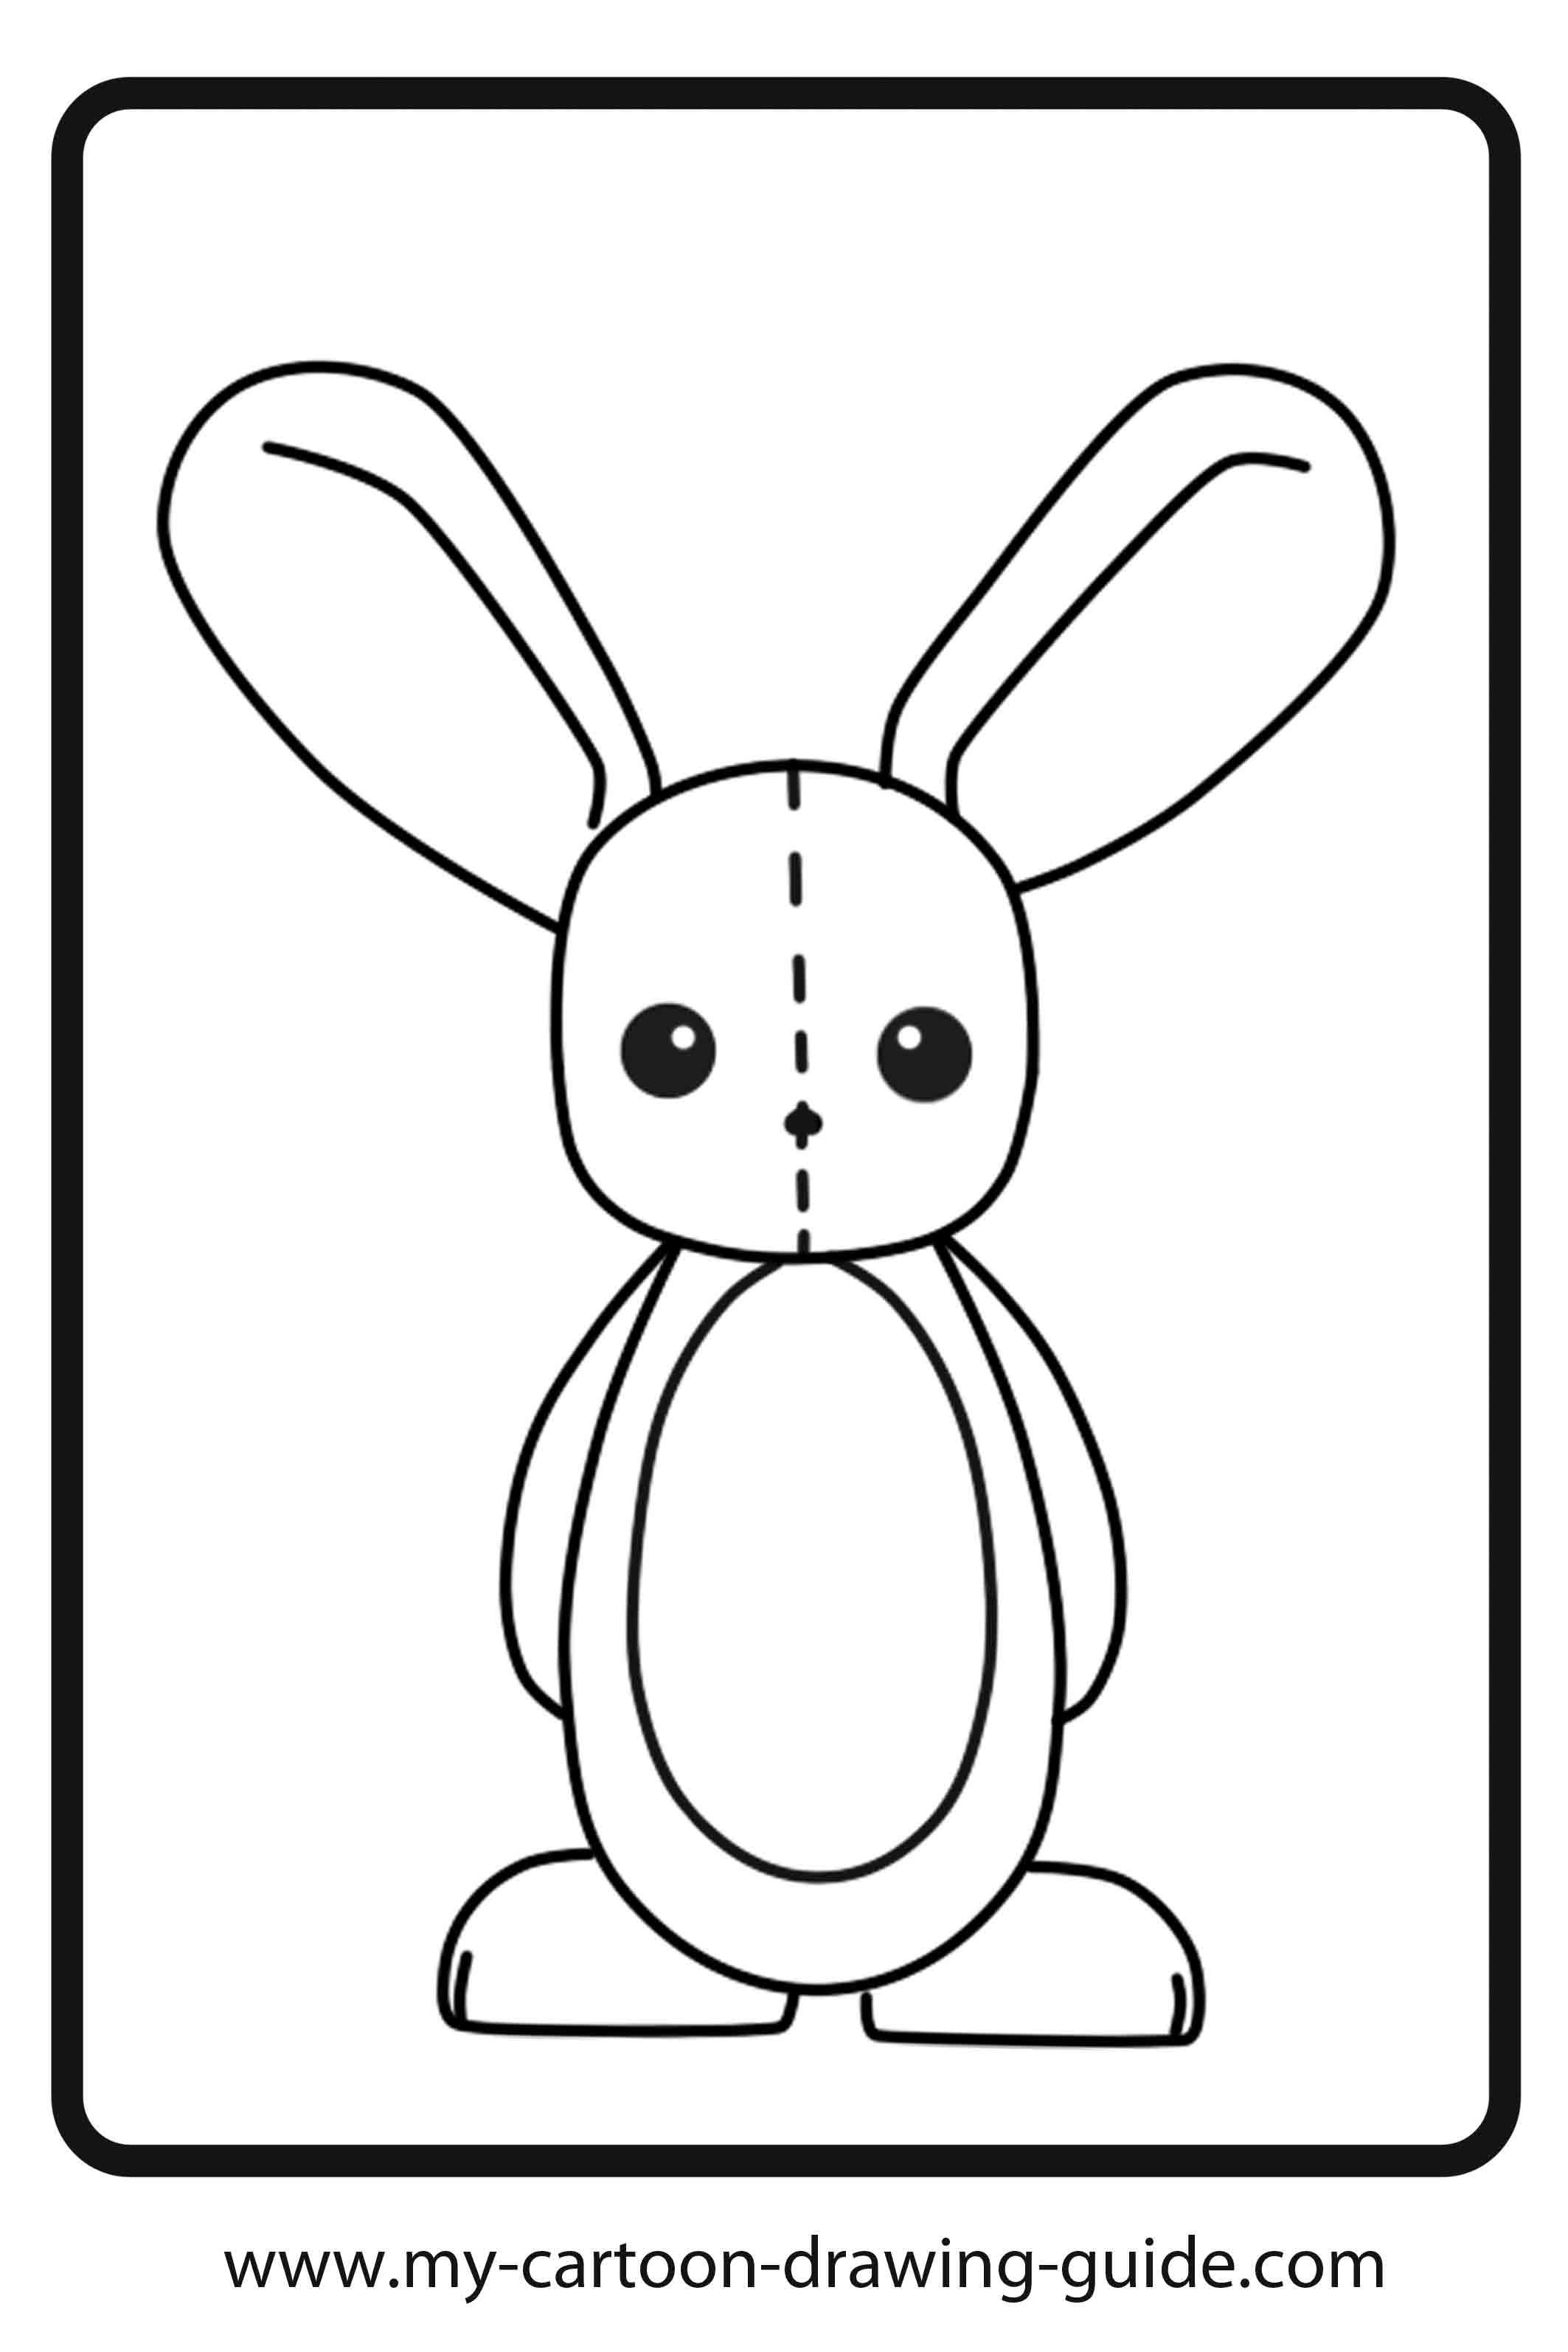 Drawing coloring #3, Download drawings